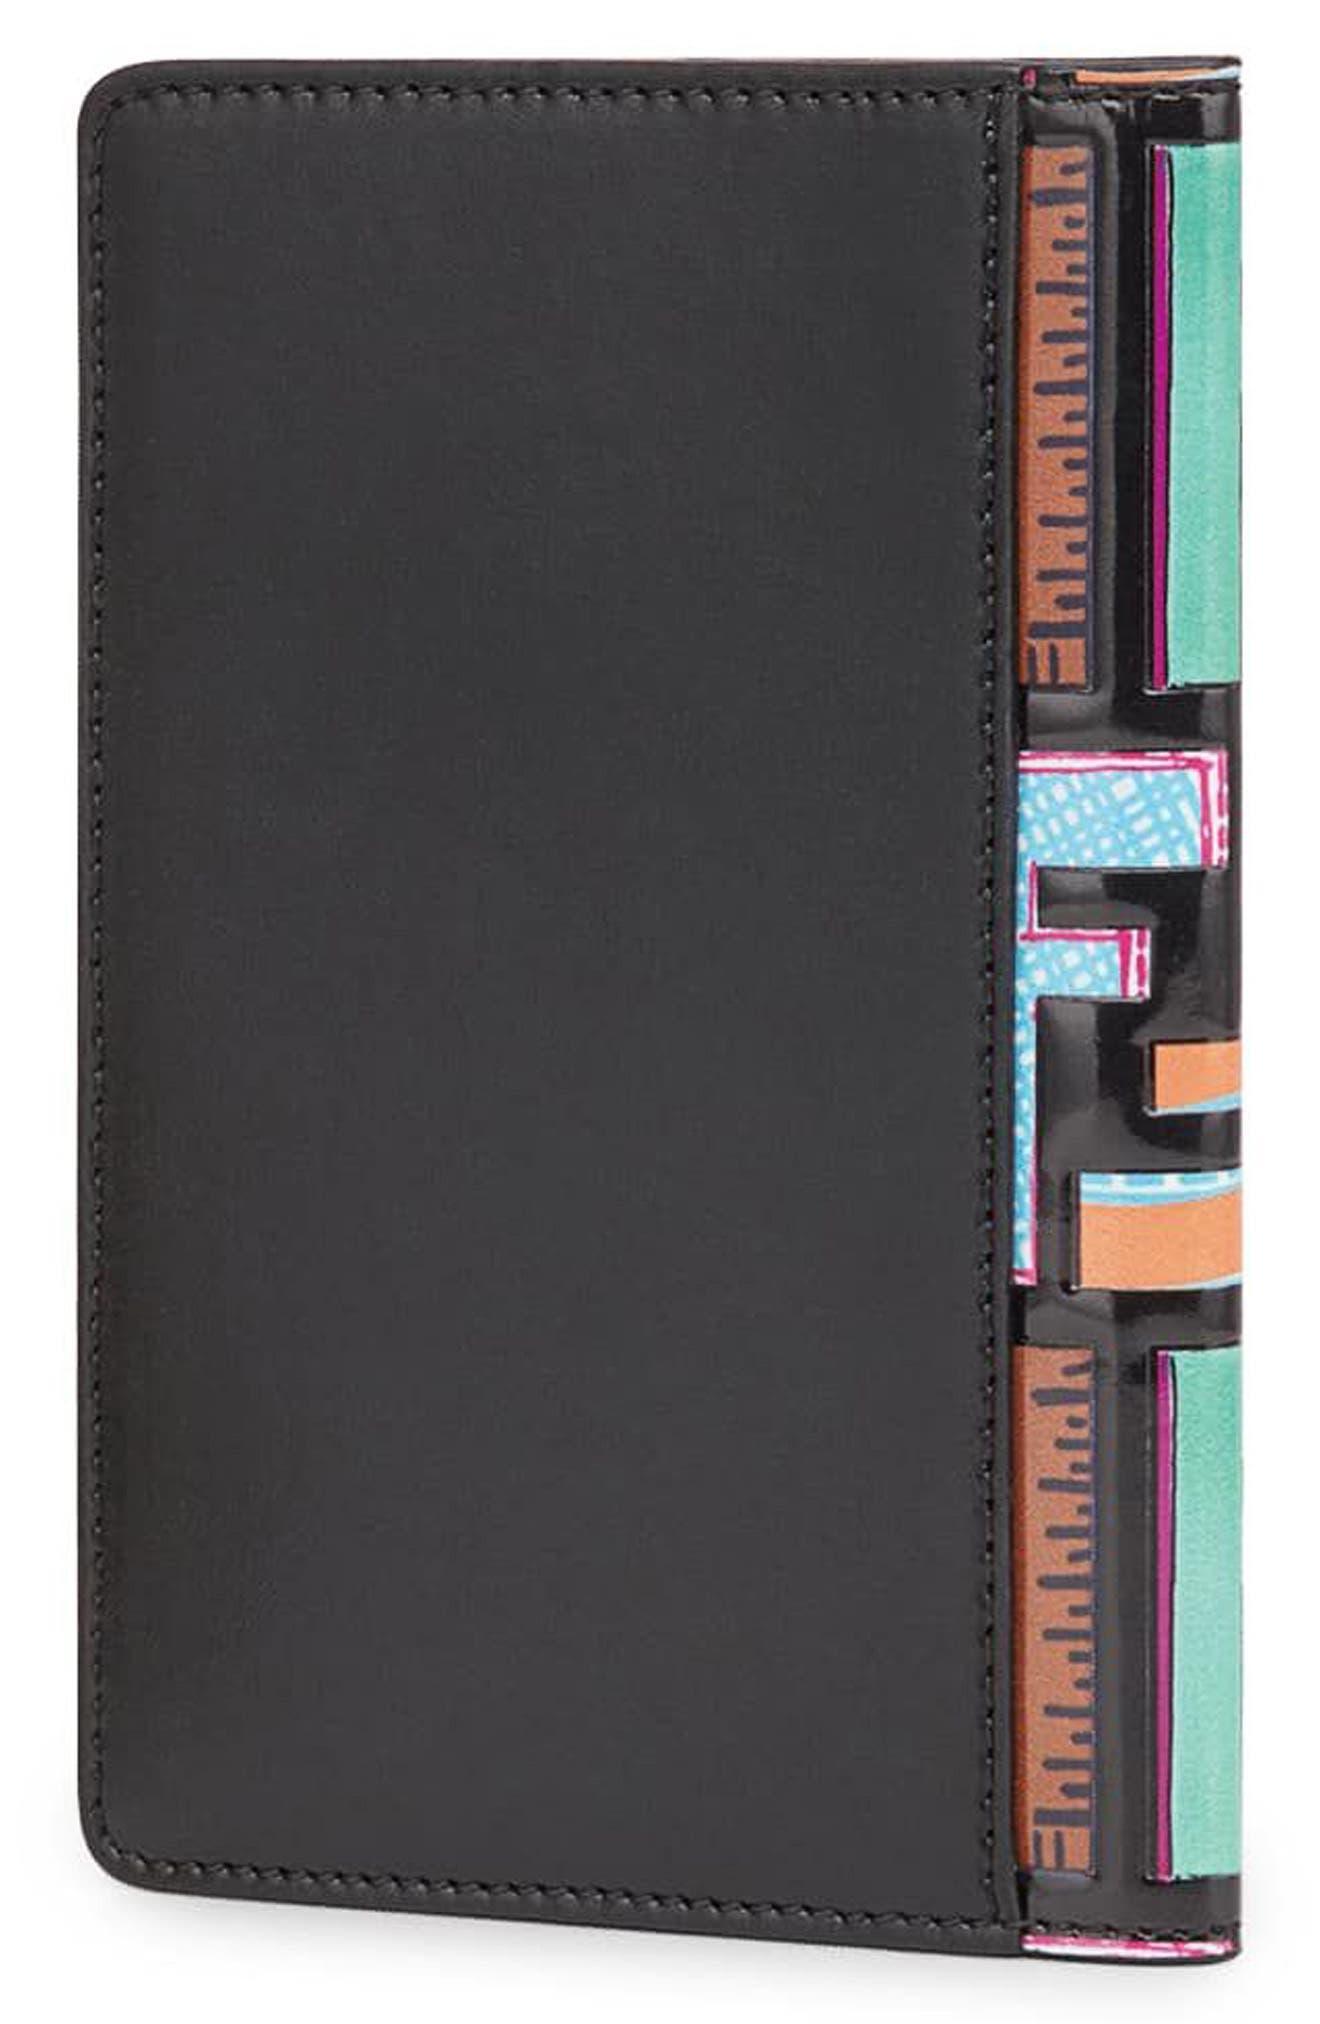 Logo Print Leather Passport Holder,                             Alternate thumbnail 3, color,                             Nero/ Palladio